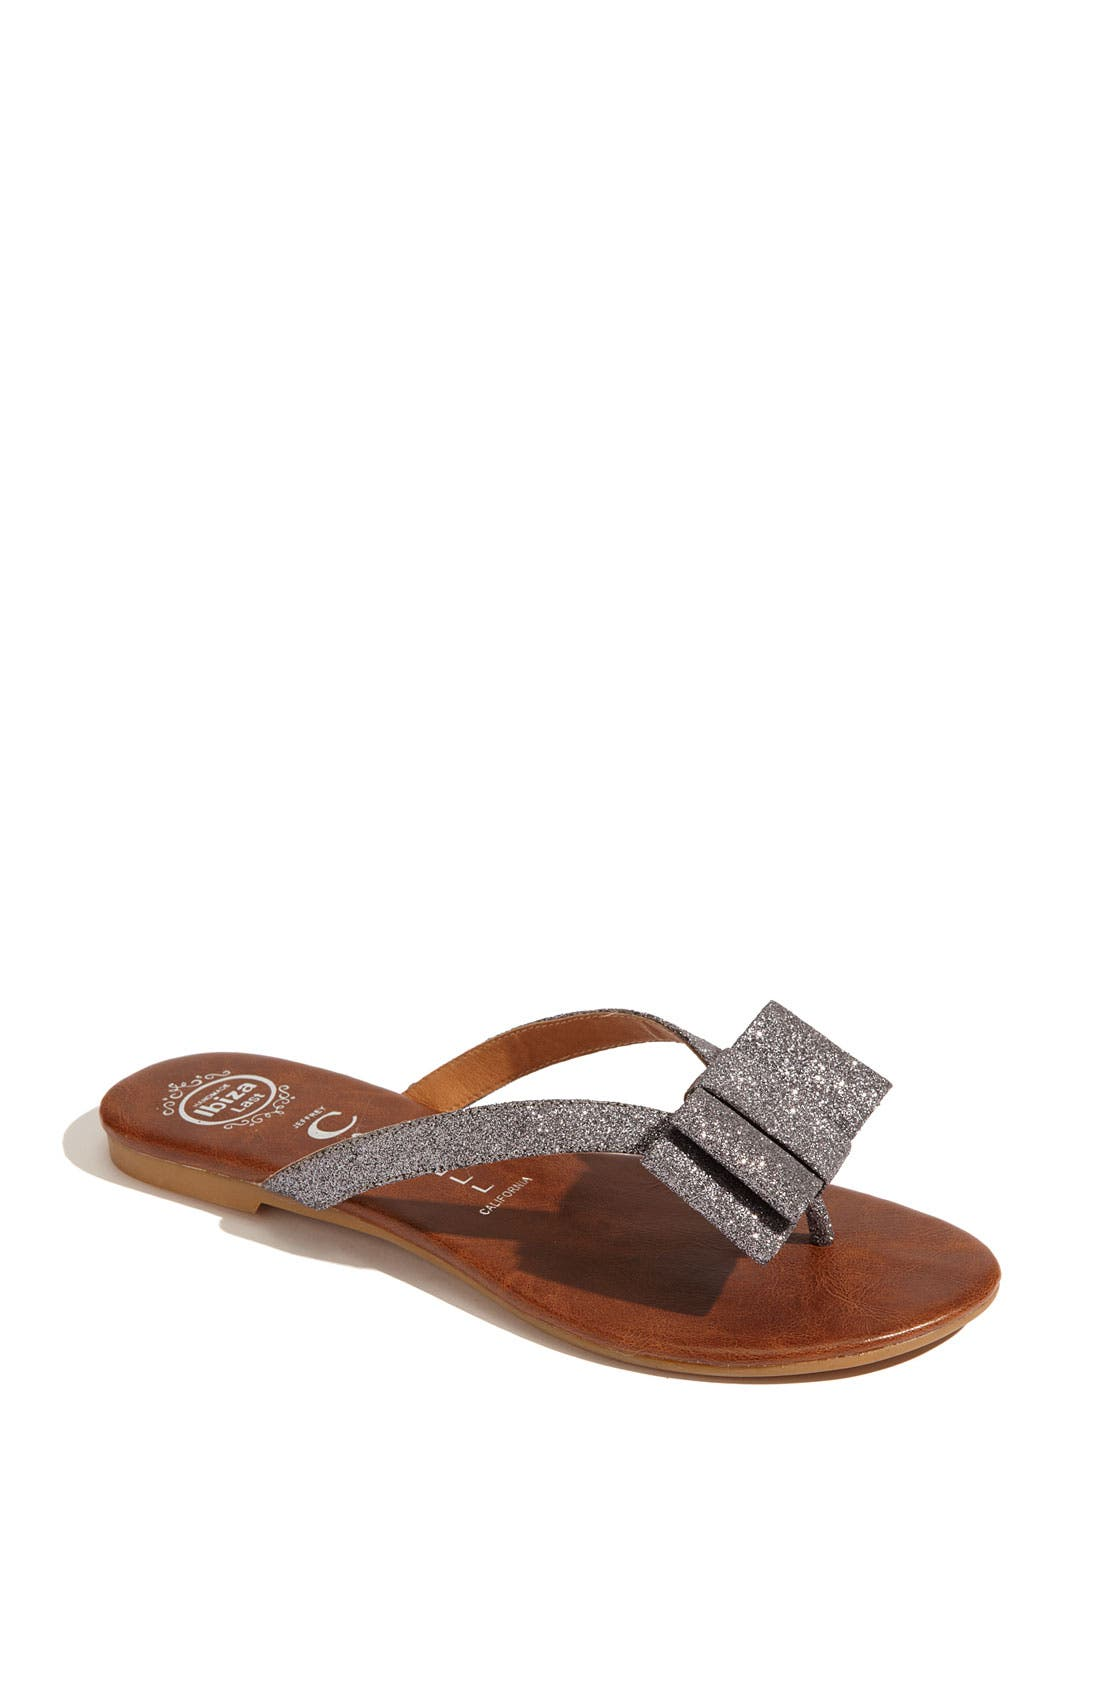 Main Image - Jeffrey Campbell 'Esmerald' Glitter Sandal